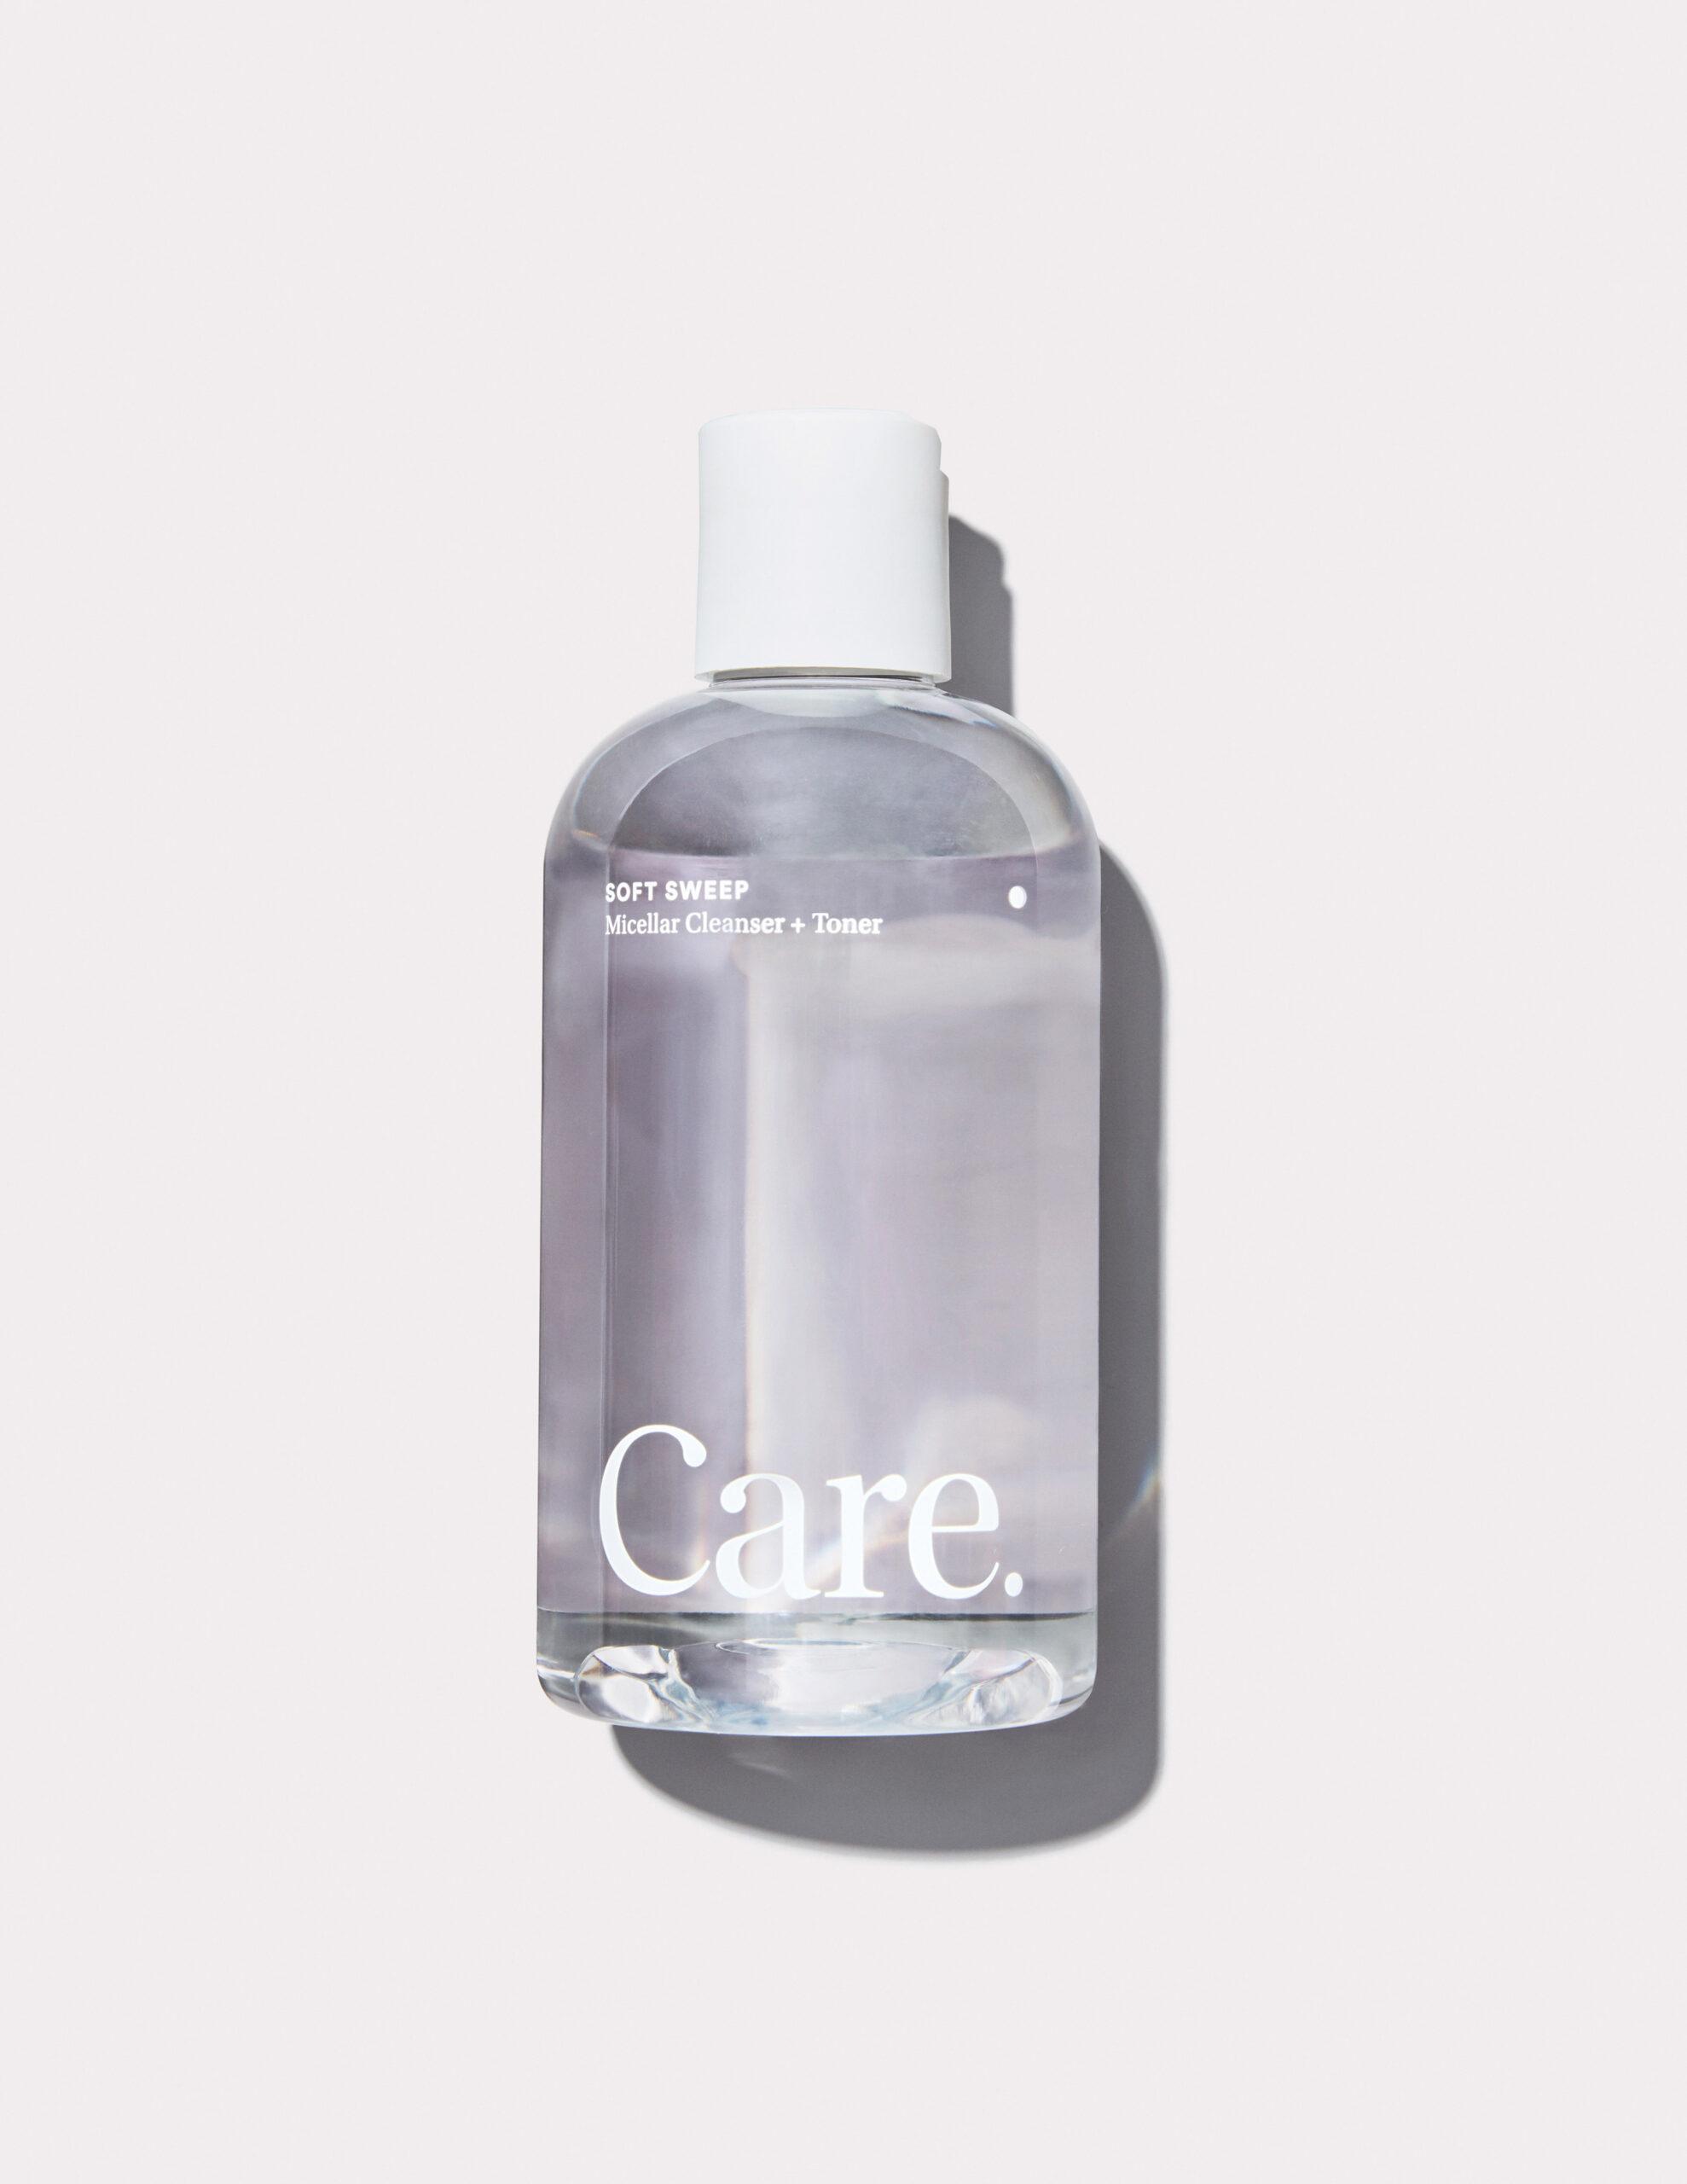 02-Care-Vertical02